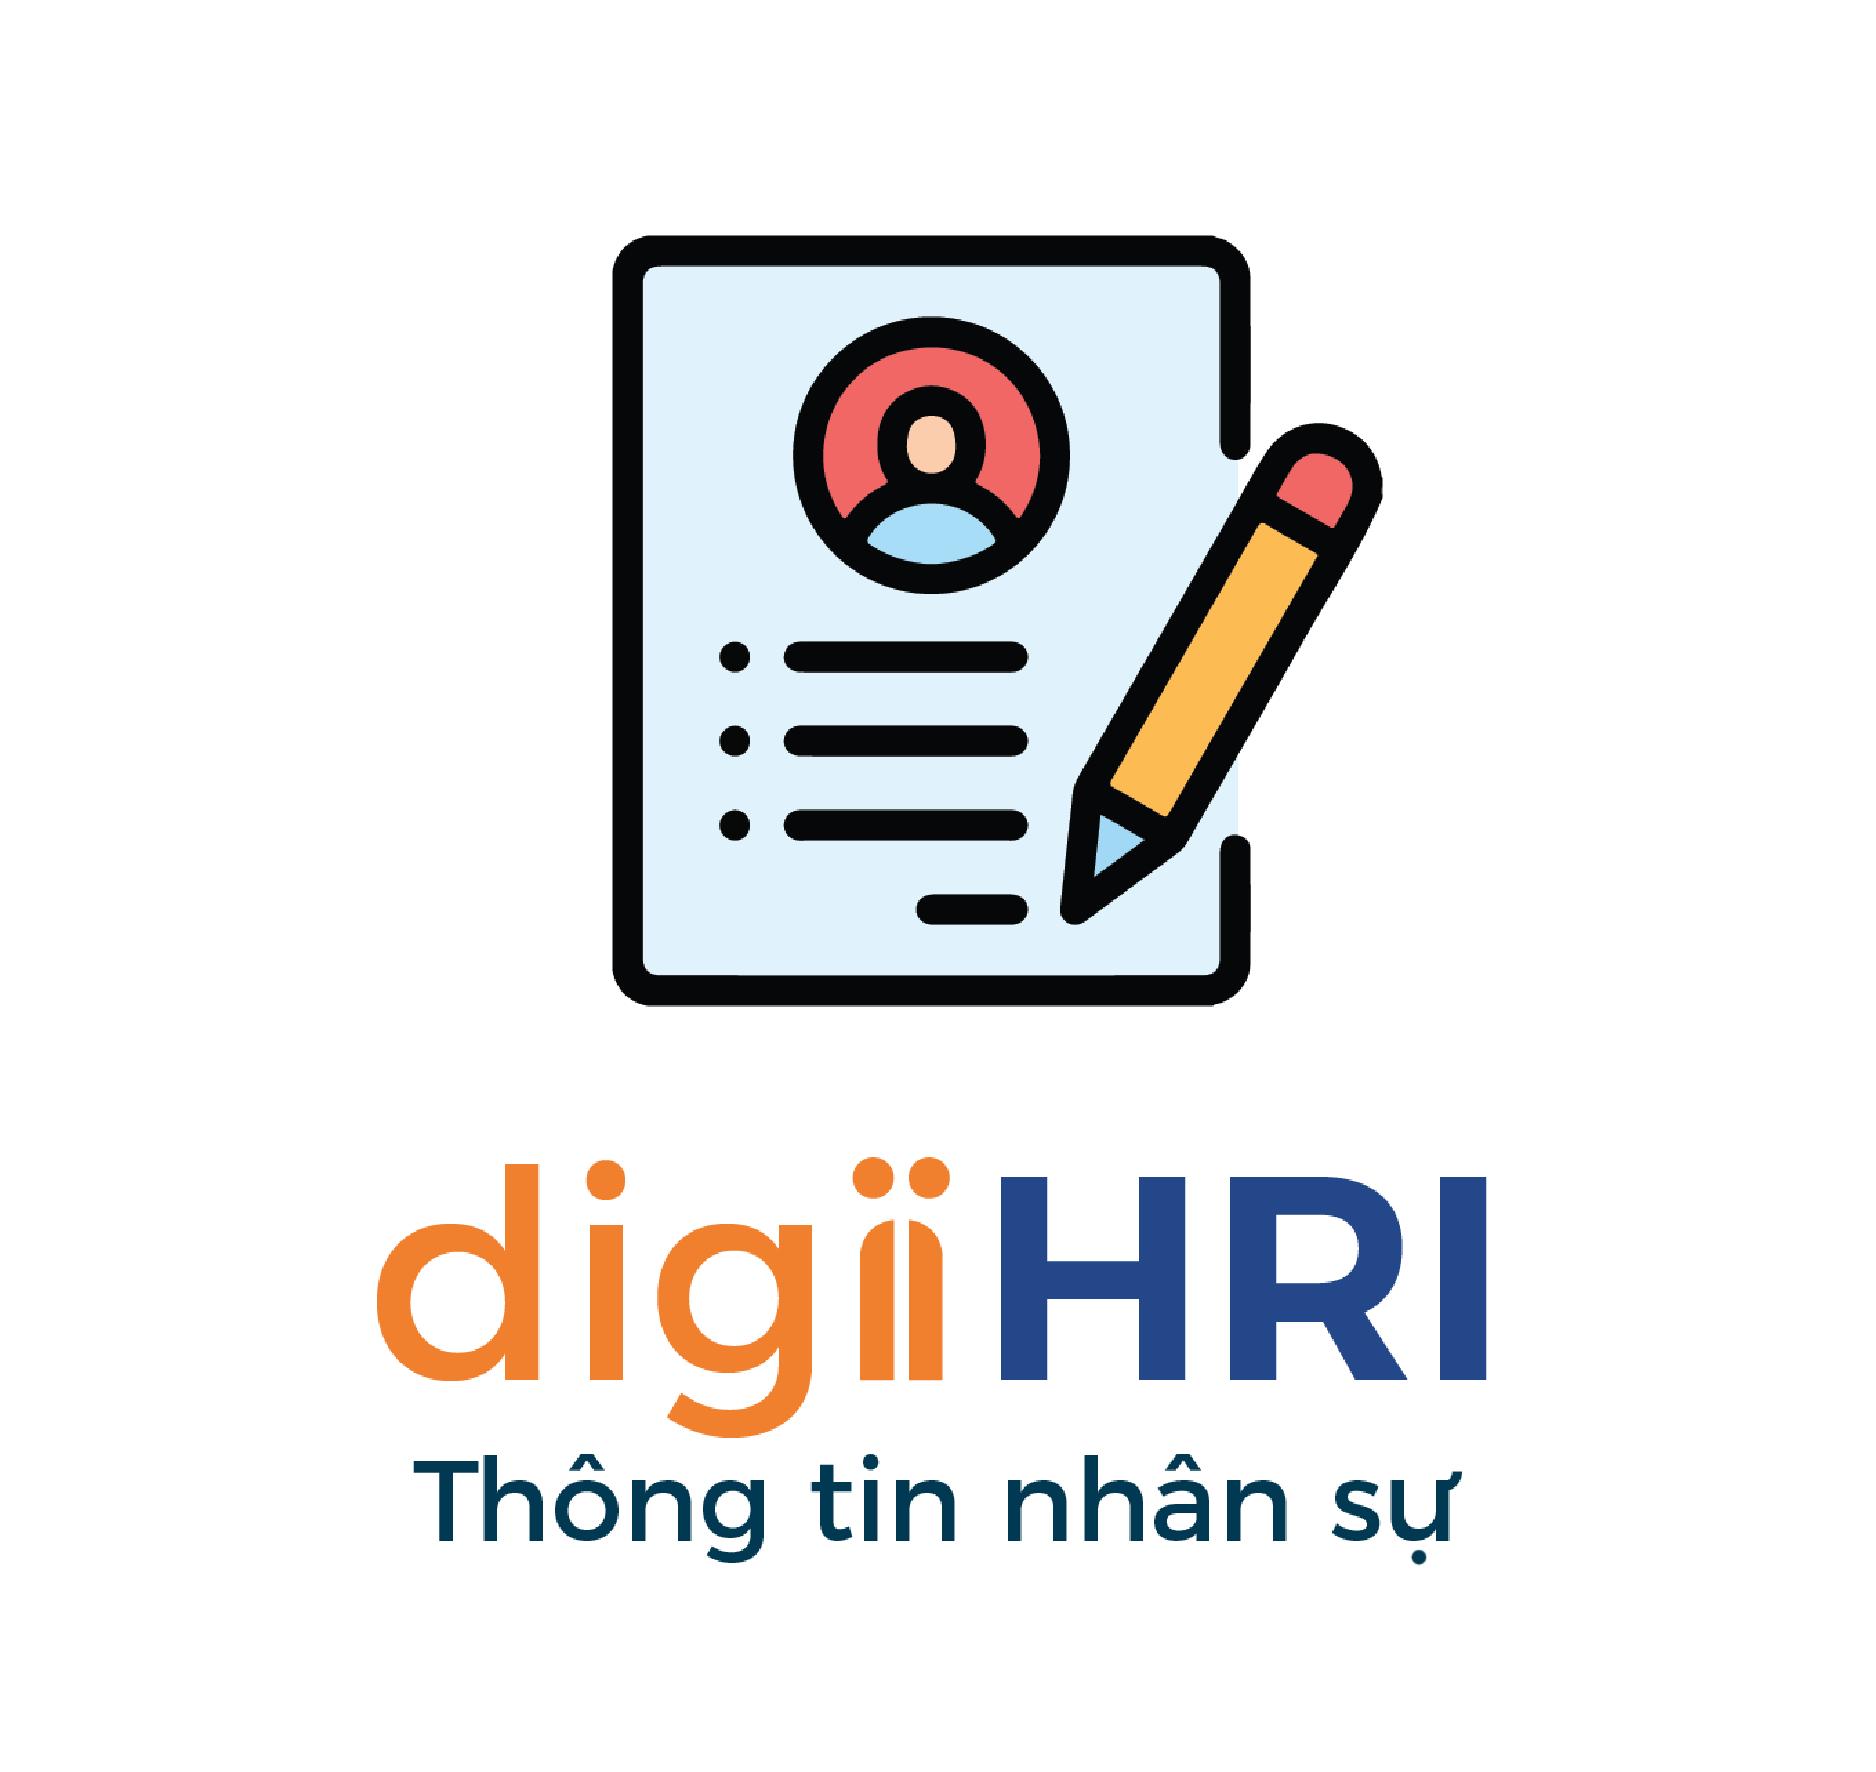 phan-mem-thong-tin-nhan-su-digiiHRI-ooc-03